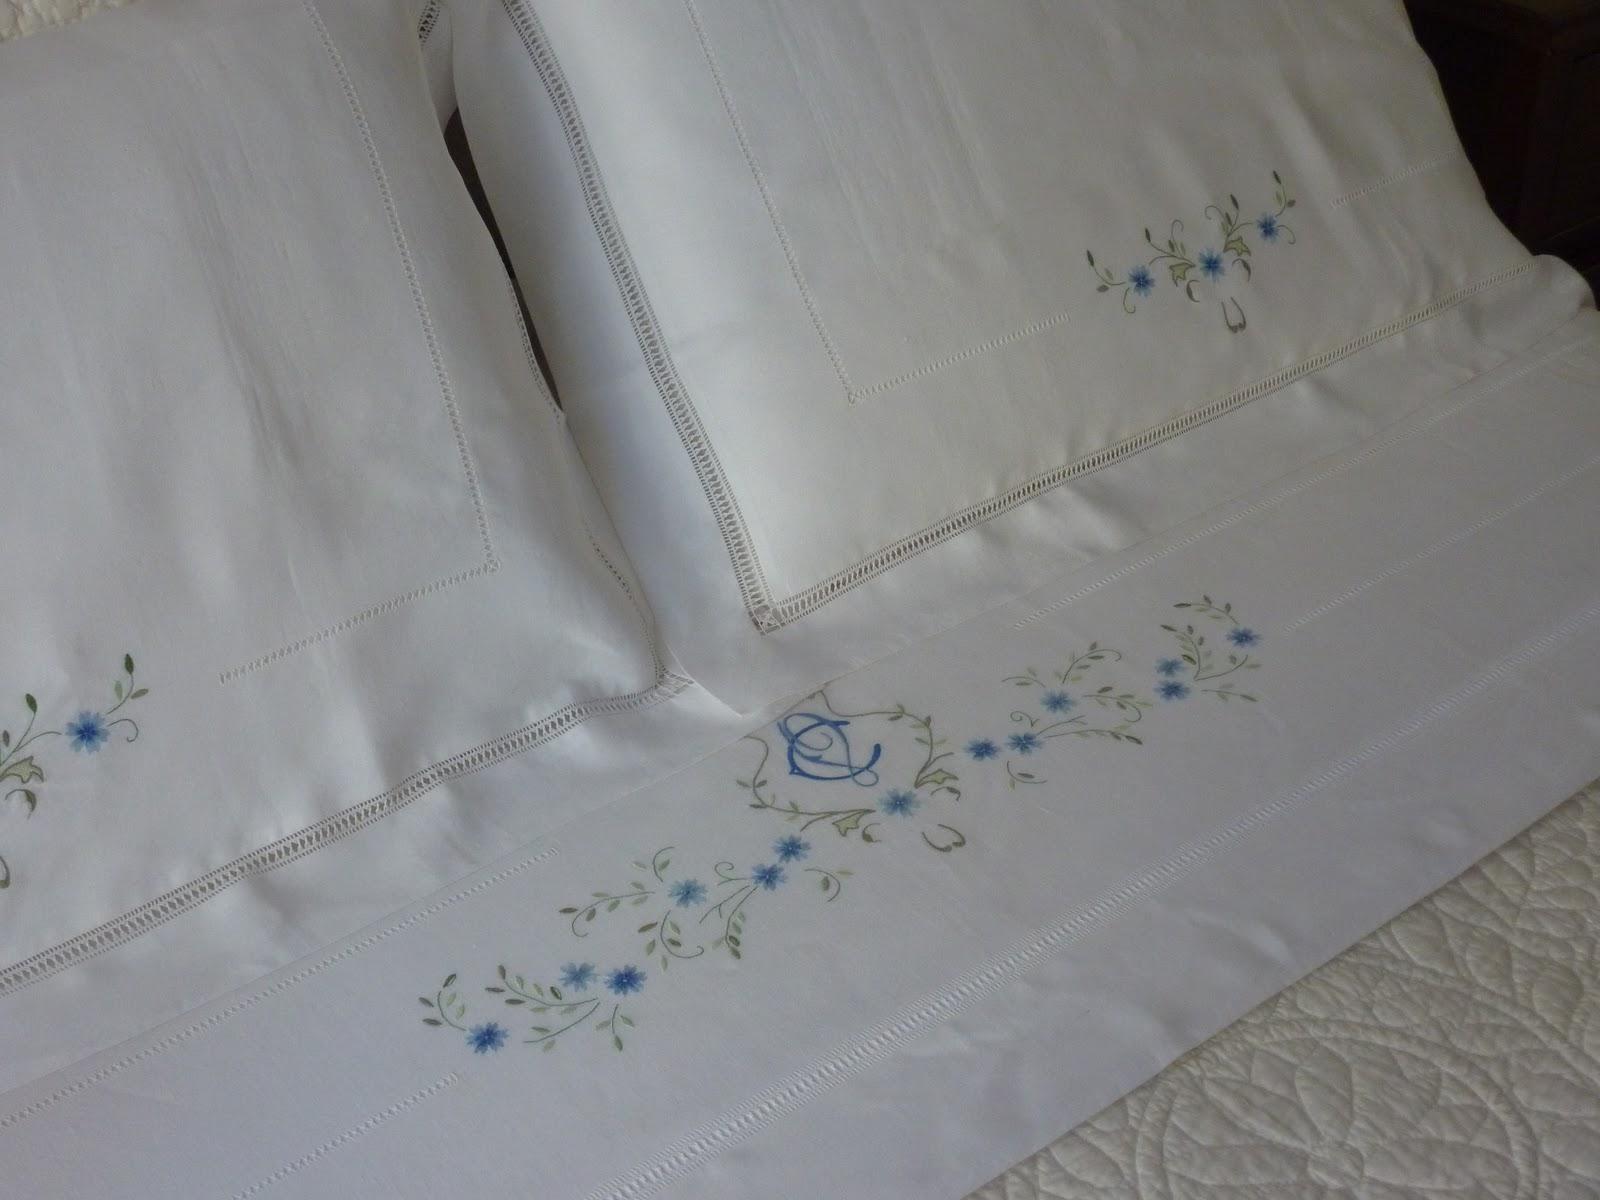 Disegni Per Lenzuola Matrimoniali.Lavanda E Lilla Lenzuola